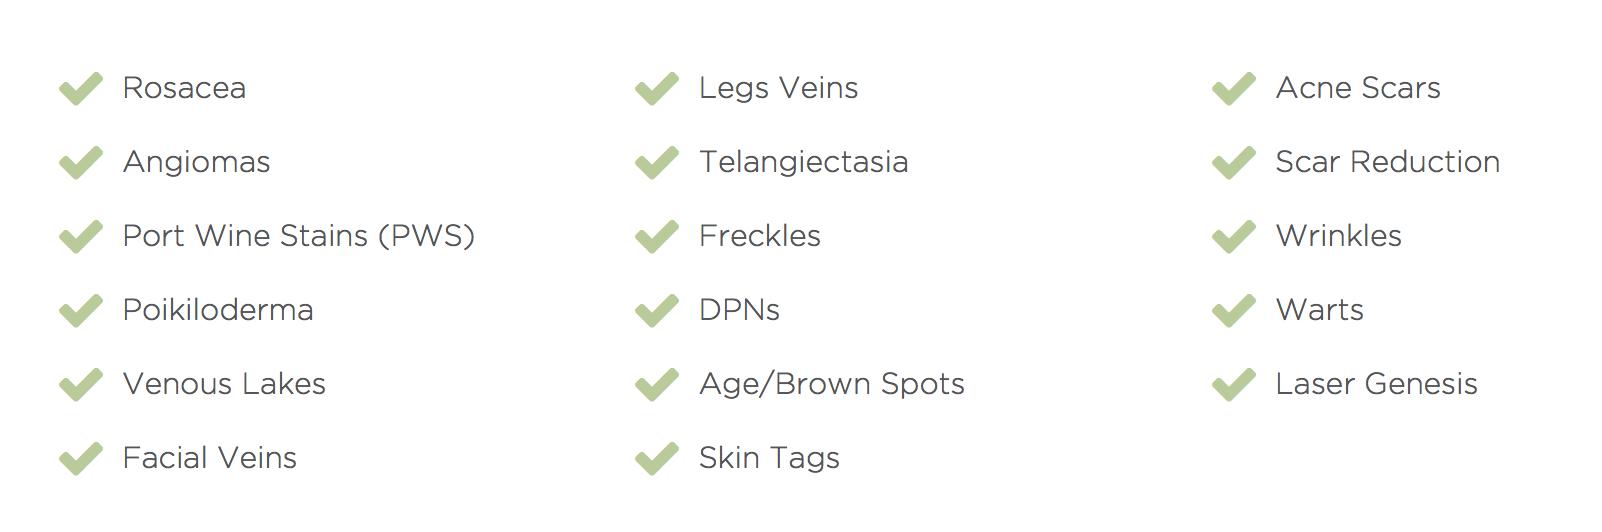 Cutera Excel V - Danesh Dermatology.png